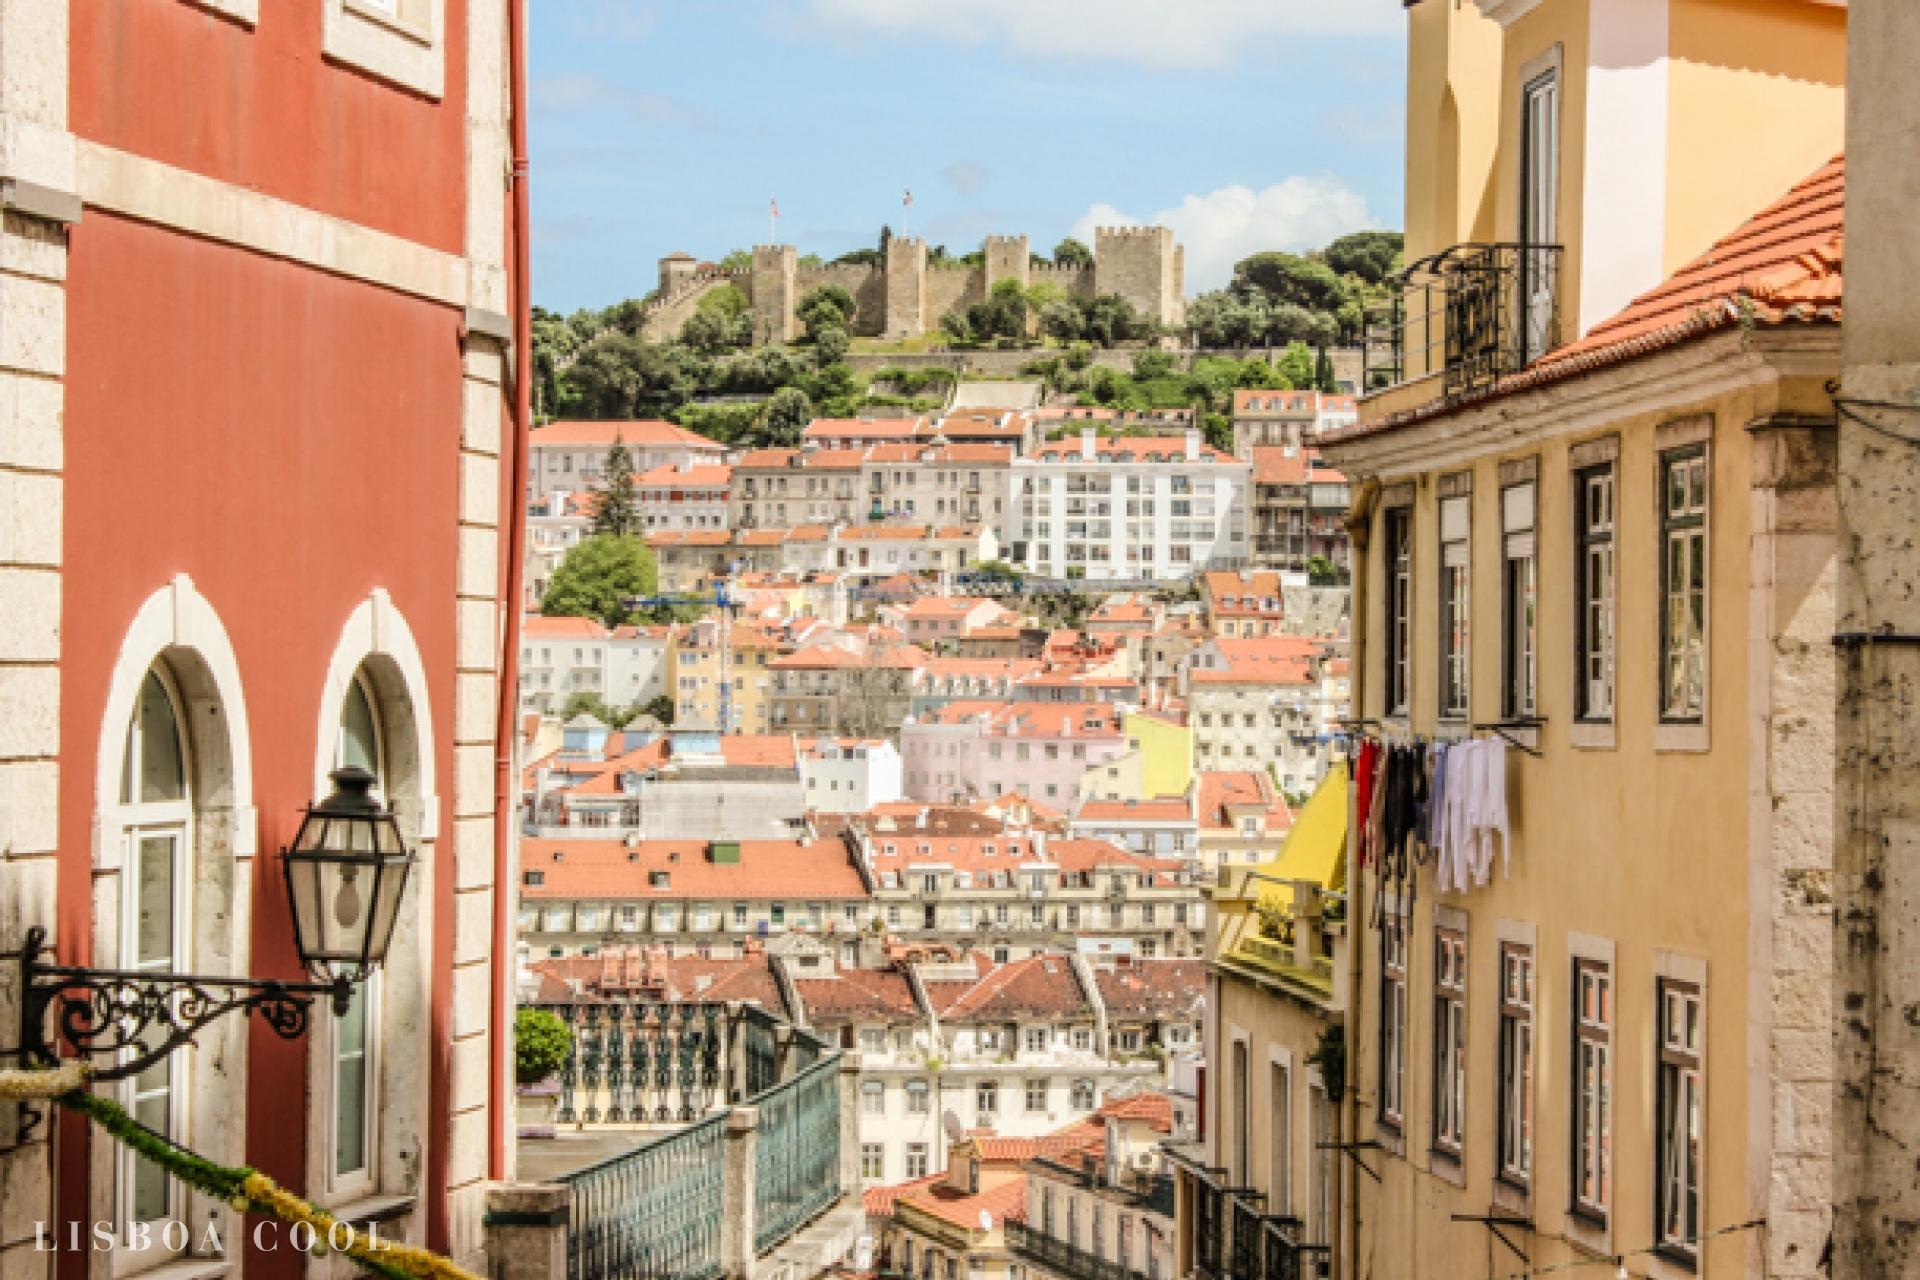 LisboaCool_Visitar_Bairro_Alto